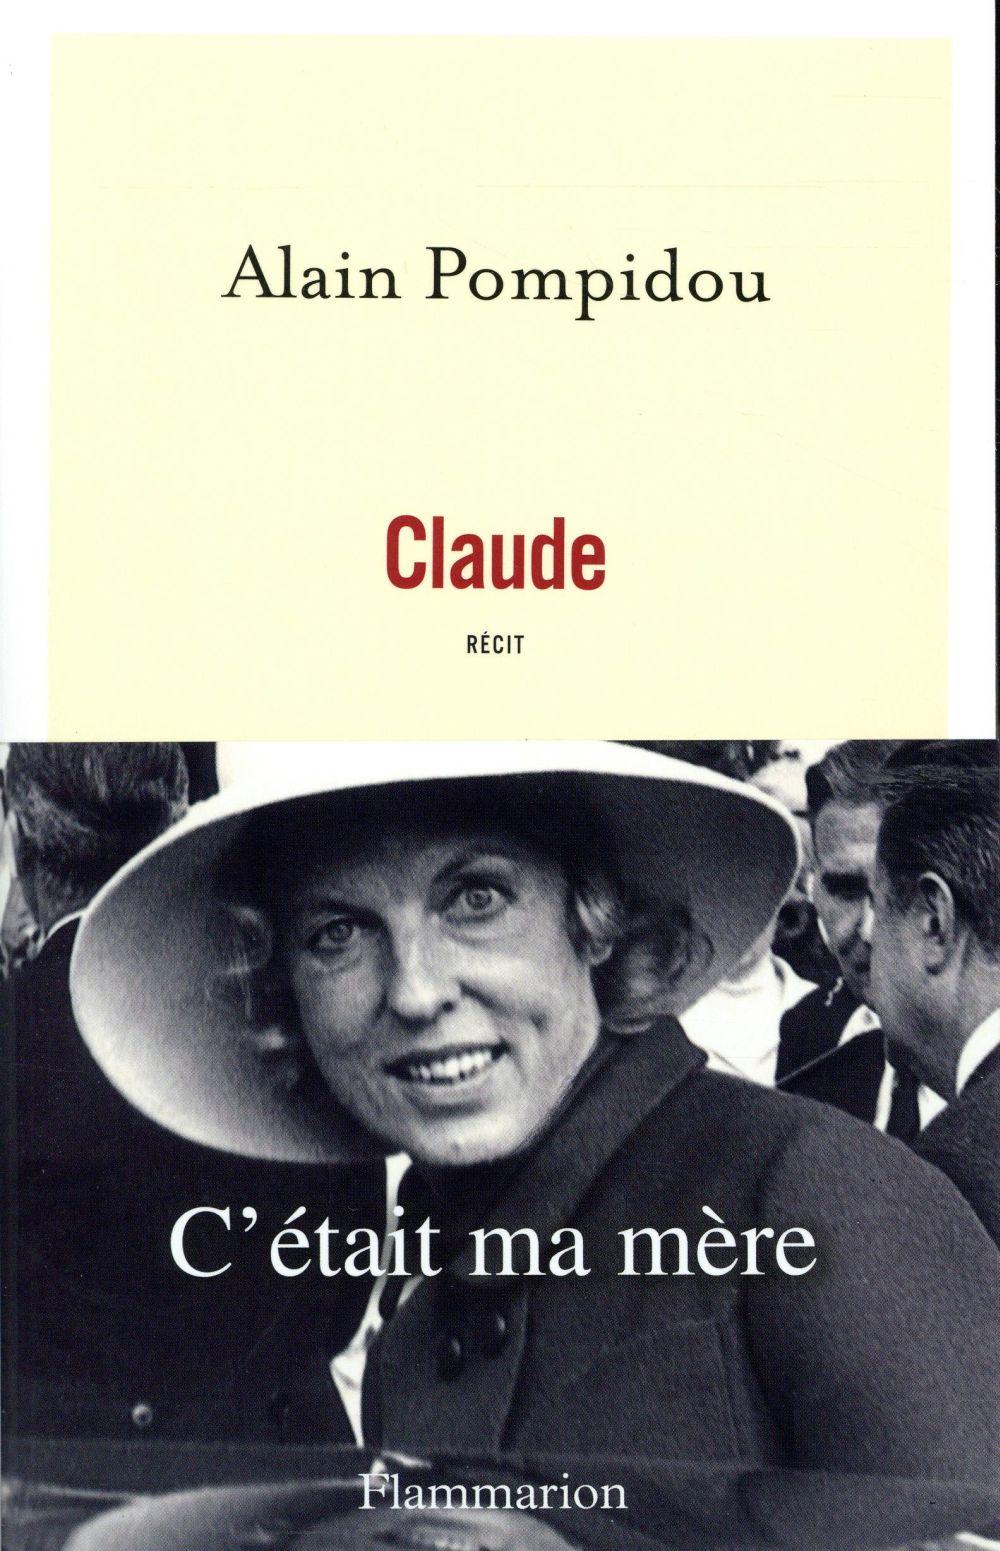 Pompidou Alain - CLAUDE